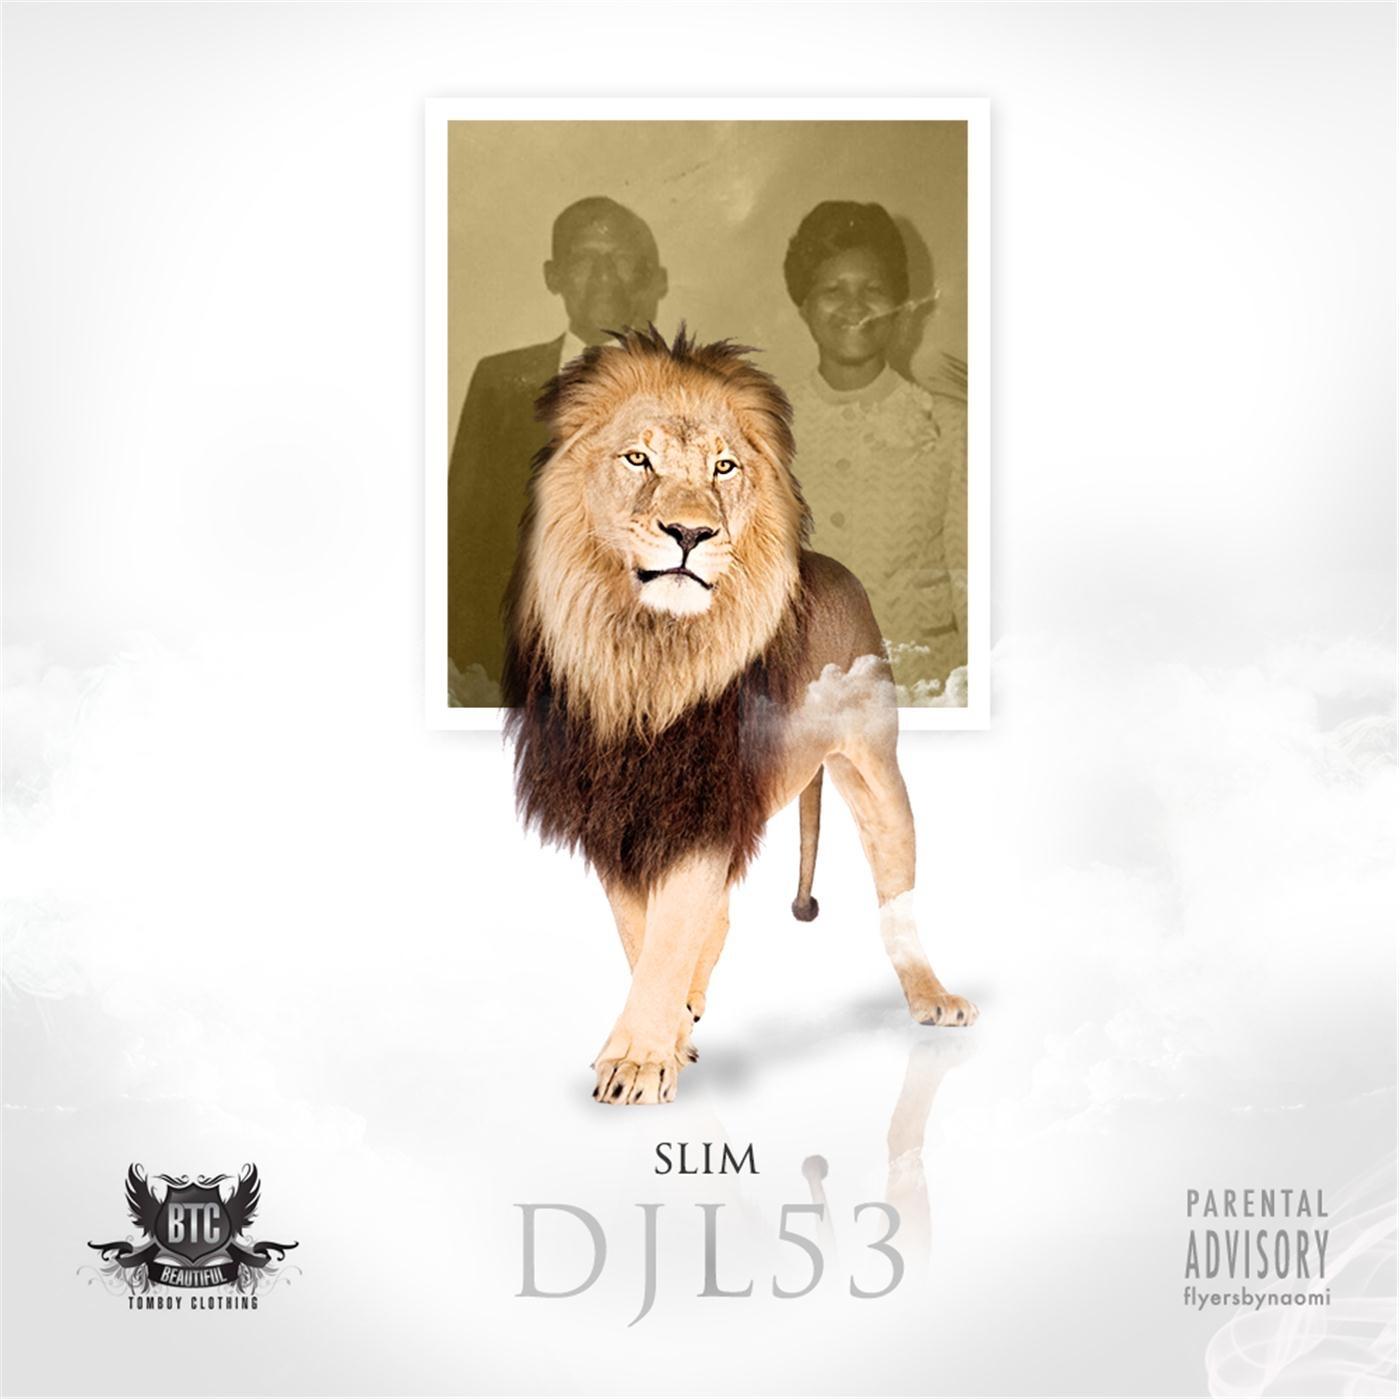 Slim album Djl53